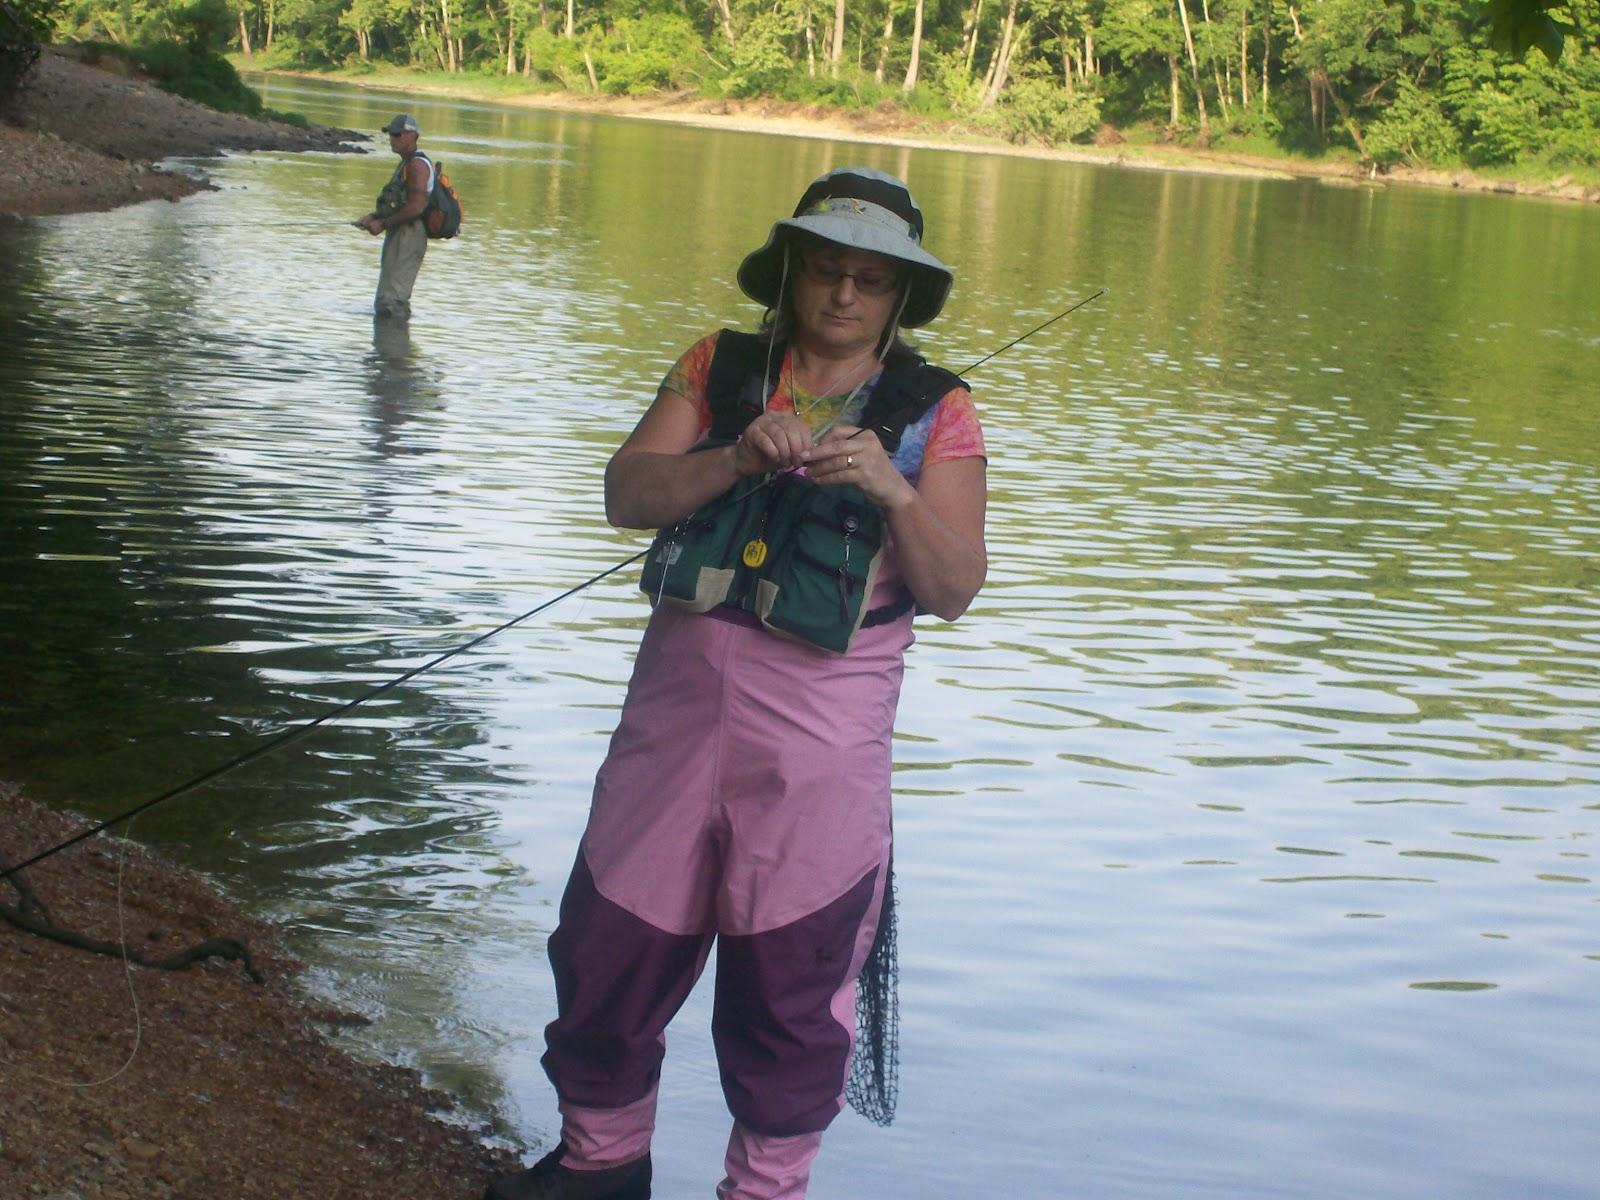 Intuitive value fly fishing on lake taneycomo for Lake elizabeth fishing